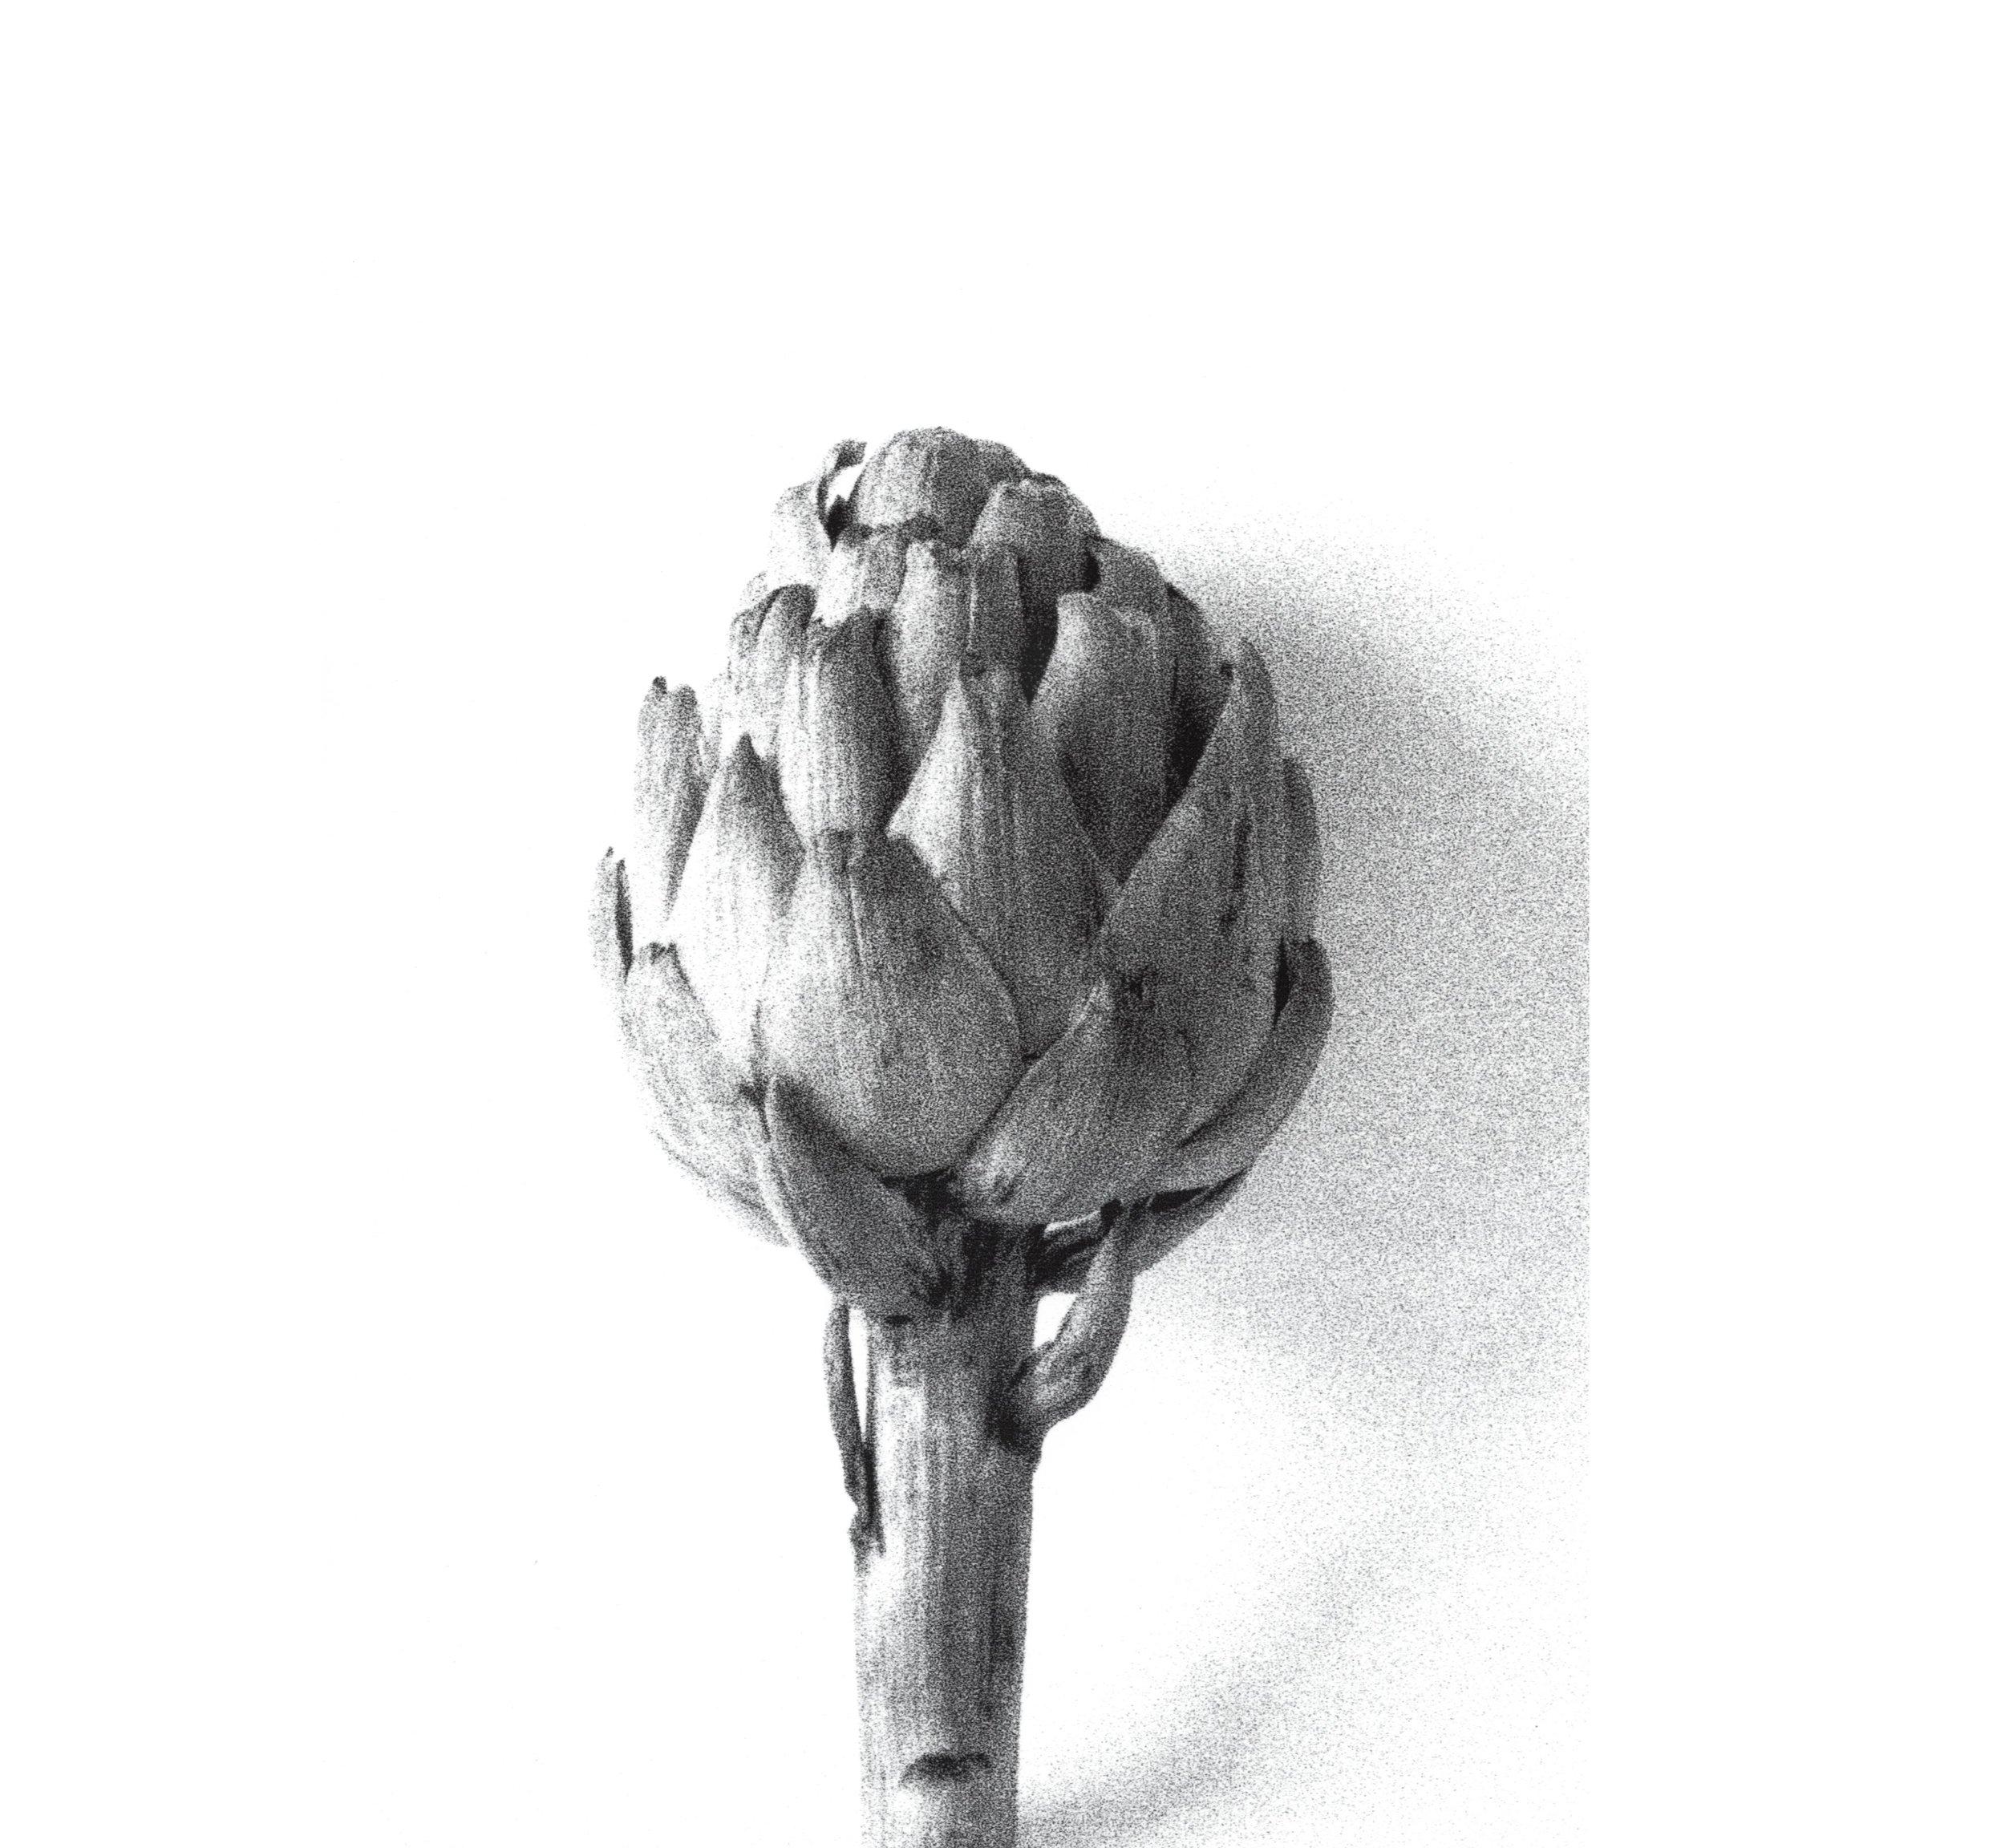 Shadow Life Series Late Morning Cynara cardunculus Var scolumus 1:1 carbon and watercolour on paper 2009